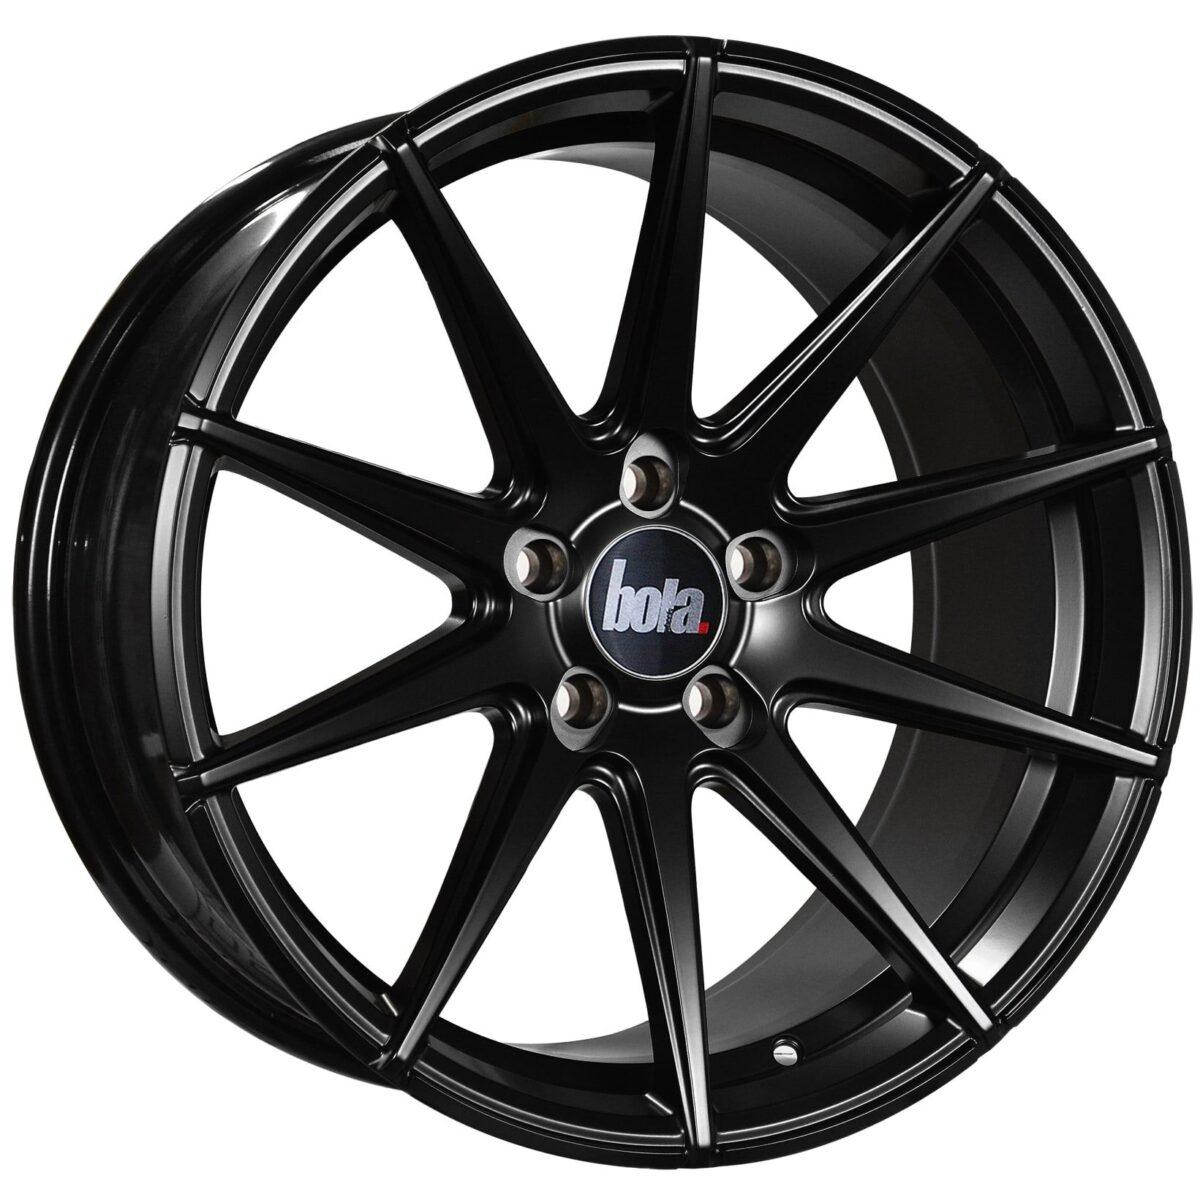 "19"" BOLA CSR Wheels - Matt Black - All BMW Models"